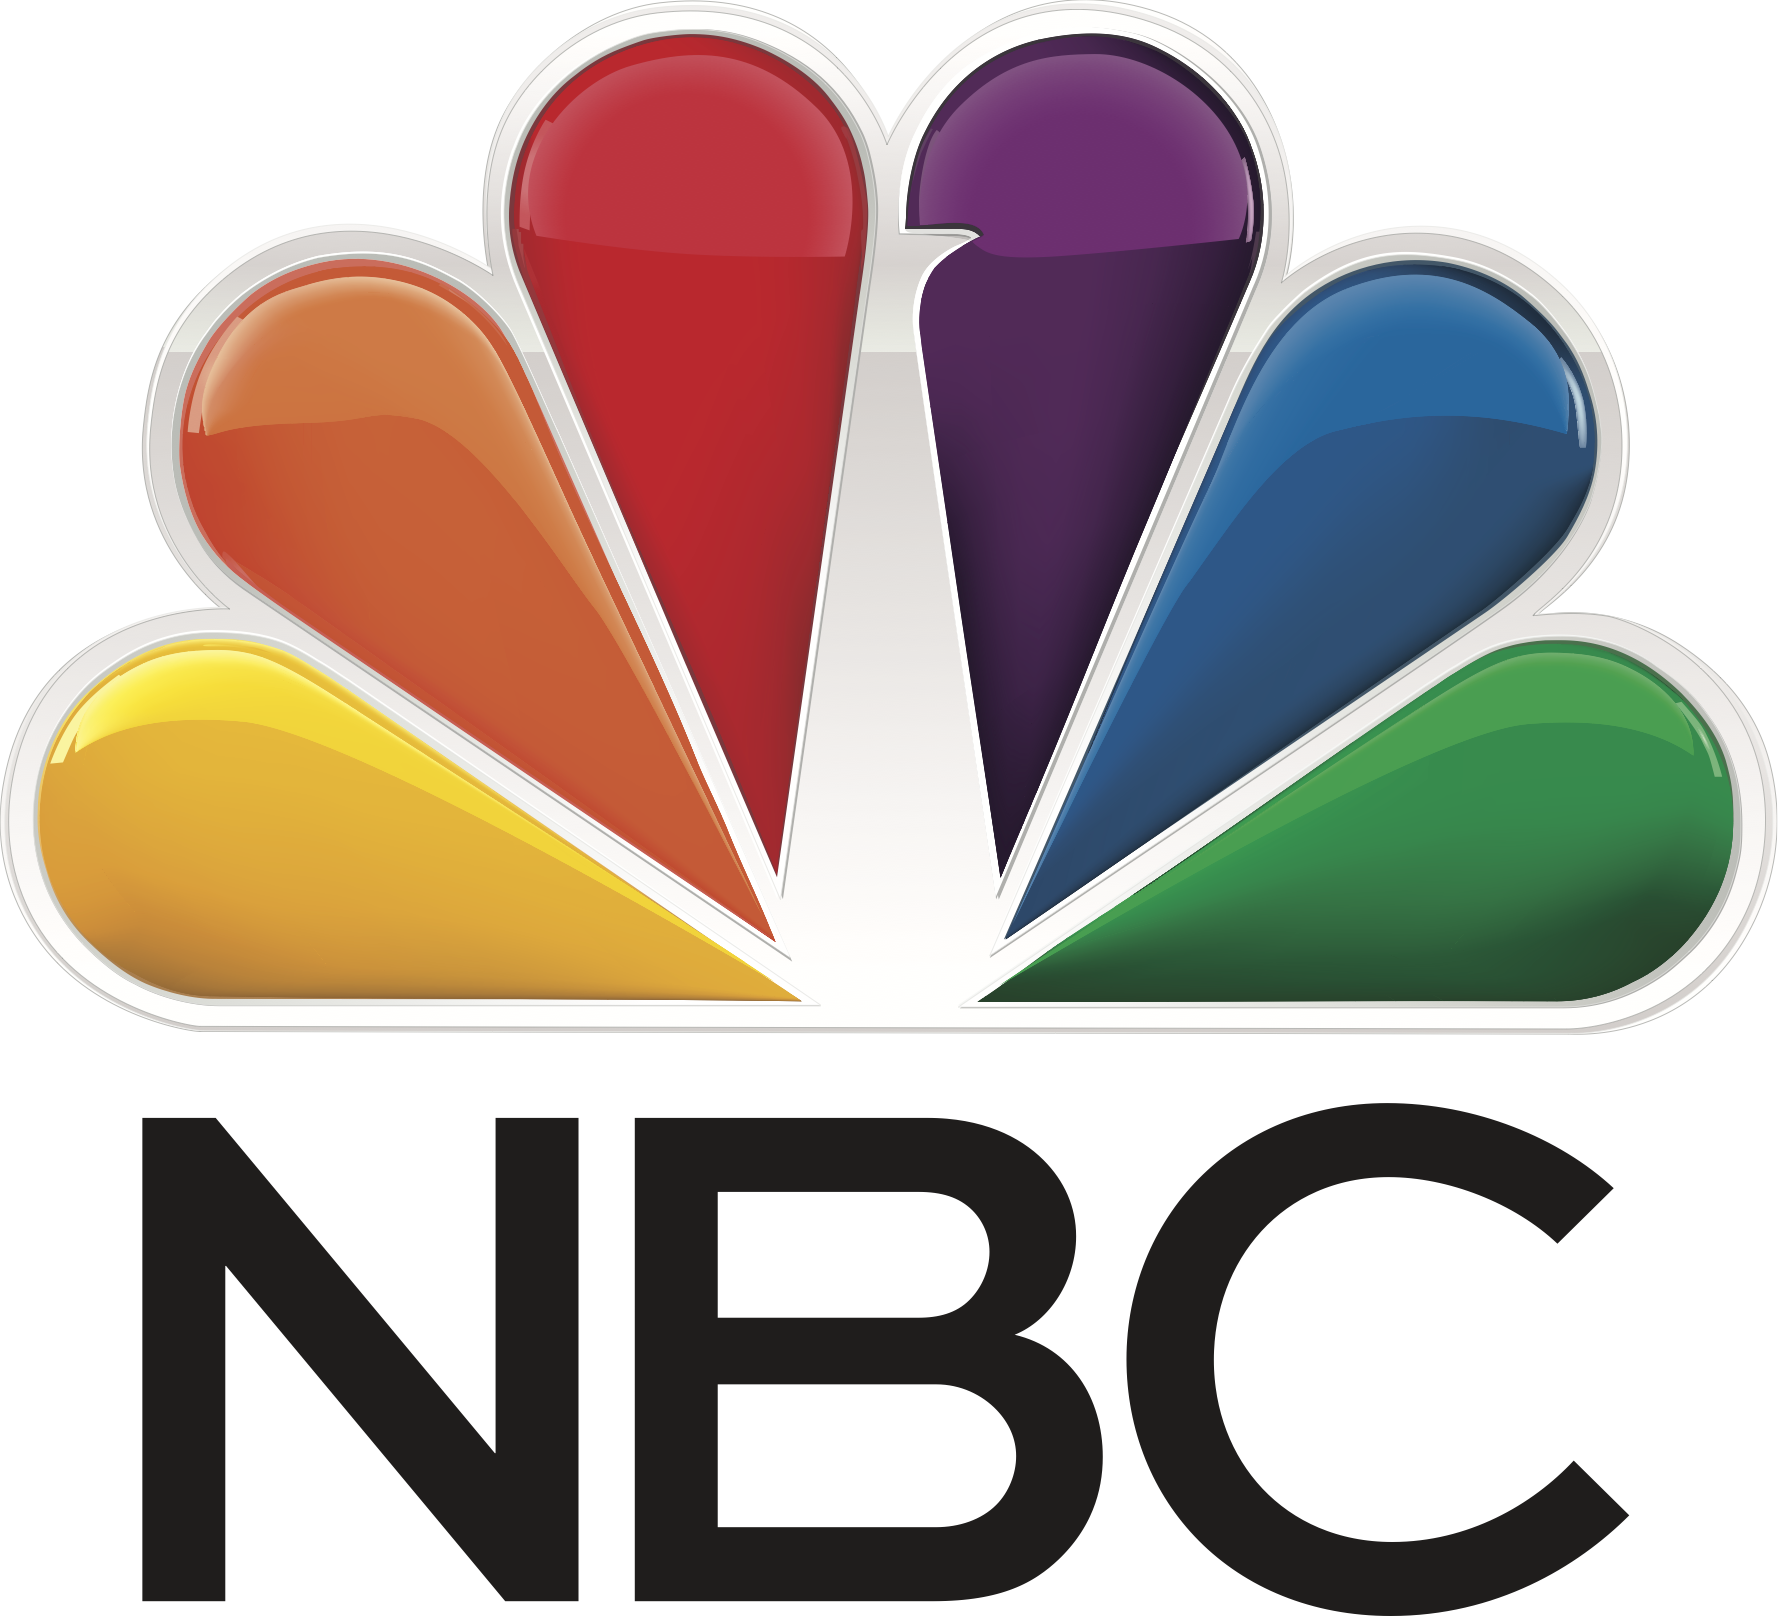 Peacock_NBC_Med_Vert